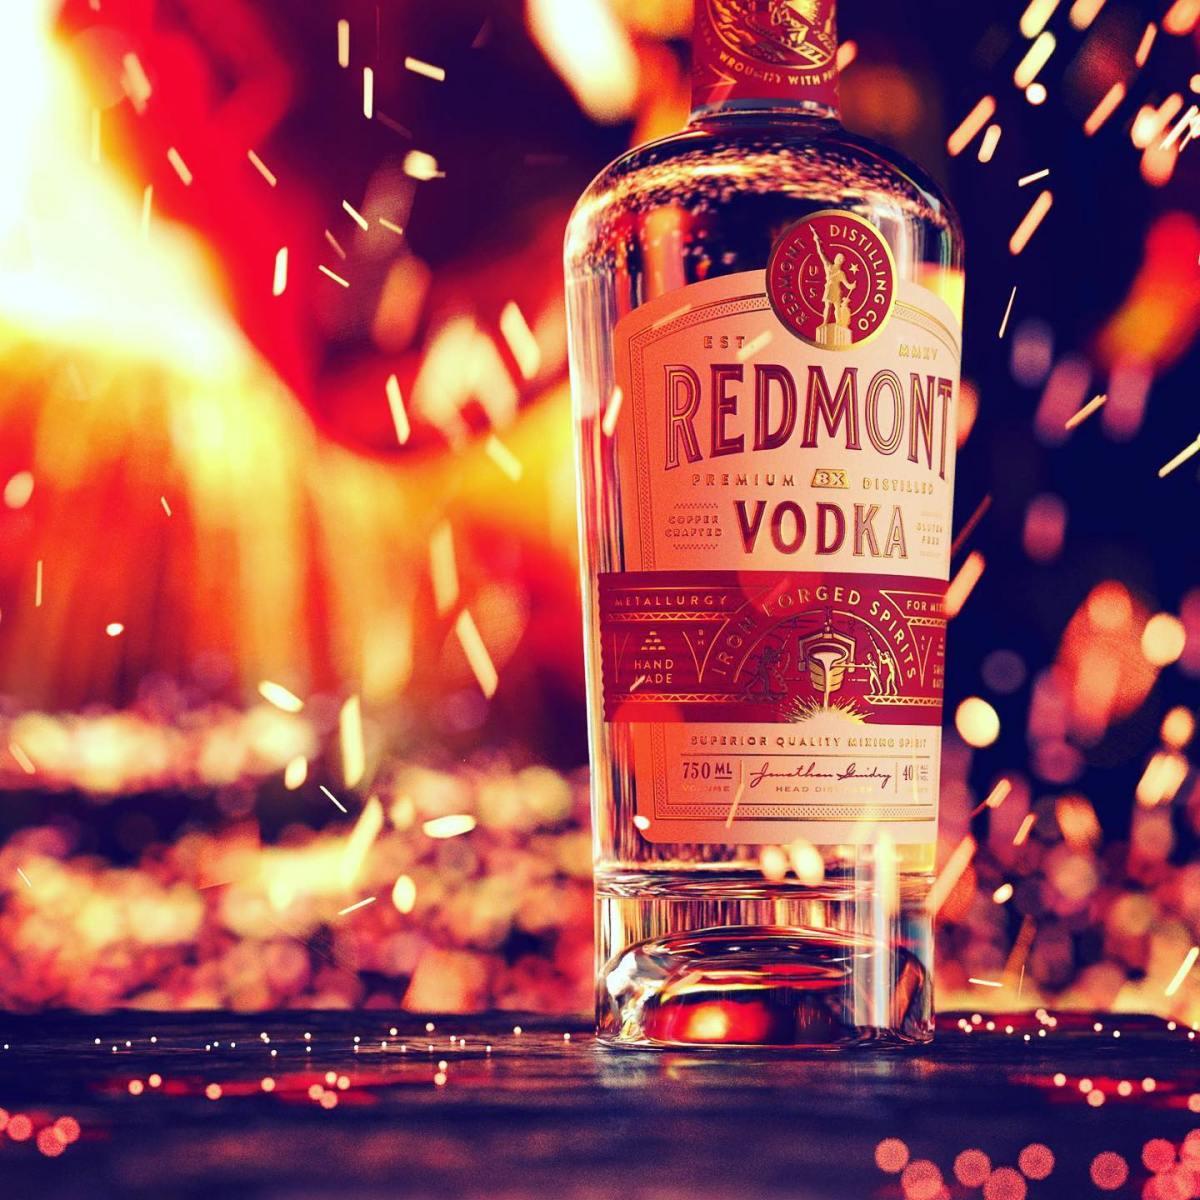 Redmont Distilling Company brings spirit to Birmingham